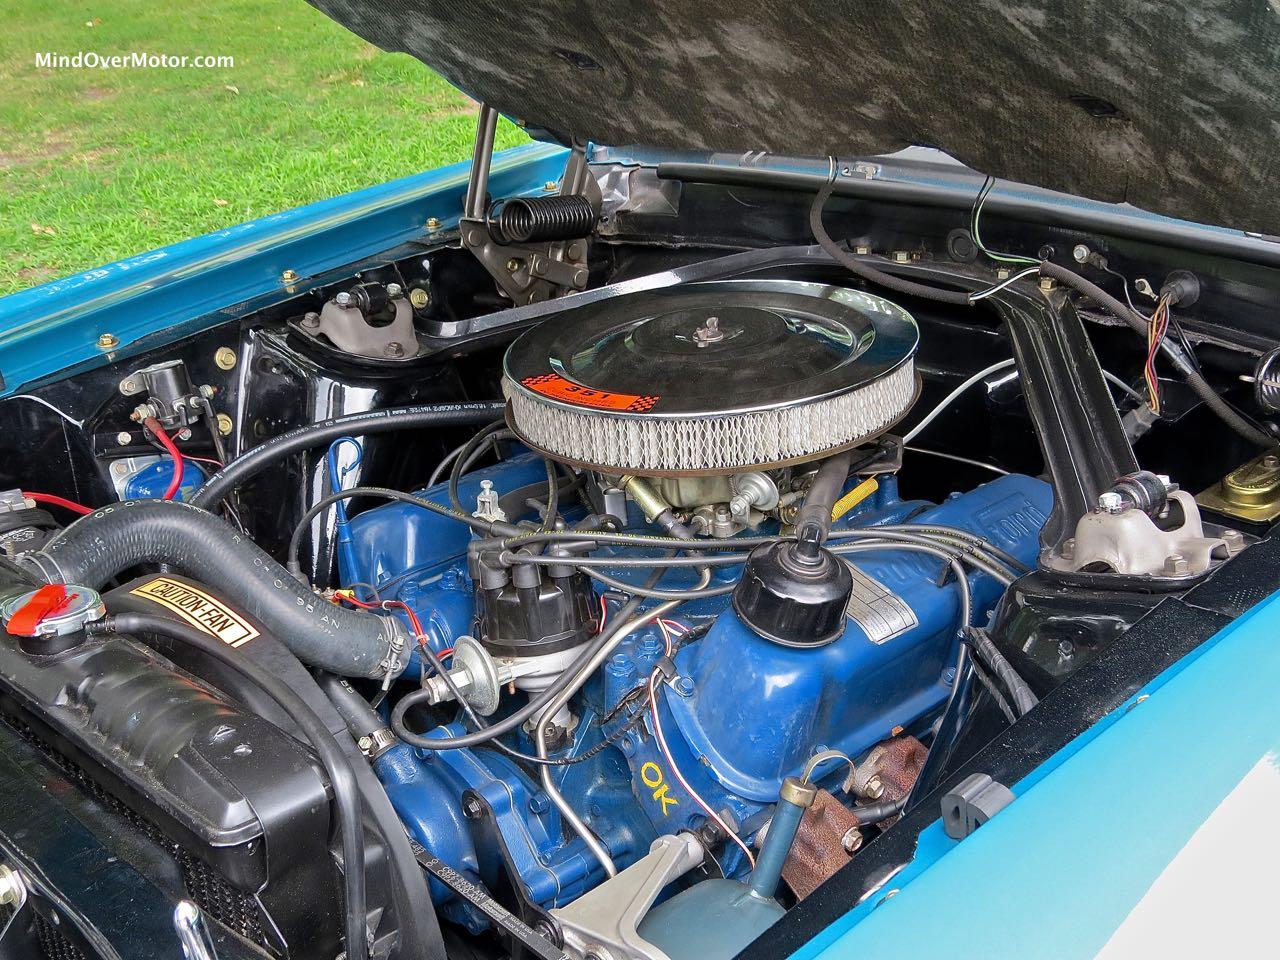 1969 Mustang Mach 1 Motor